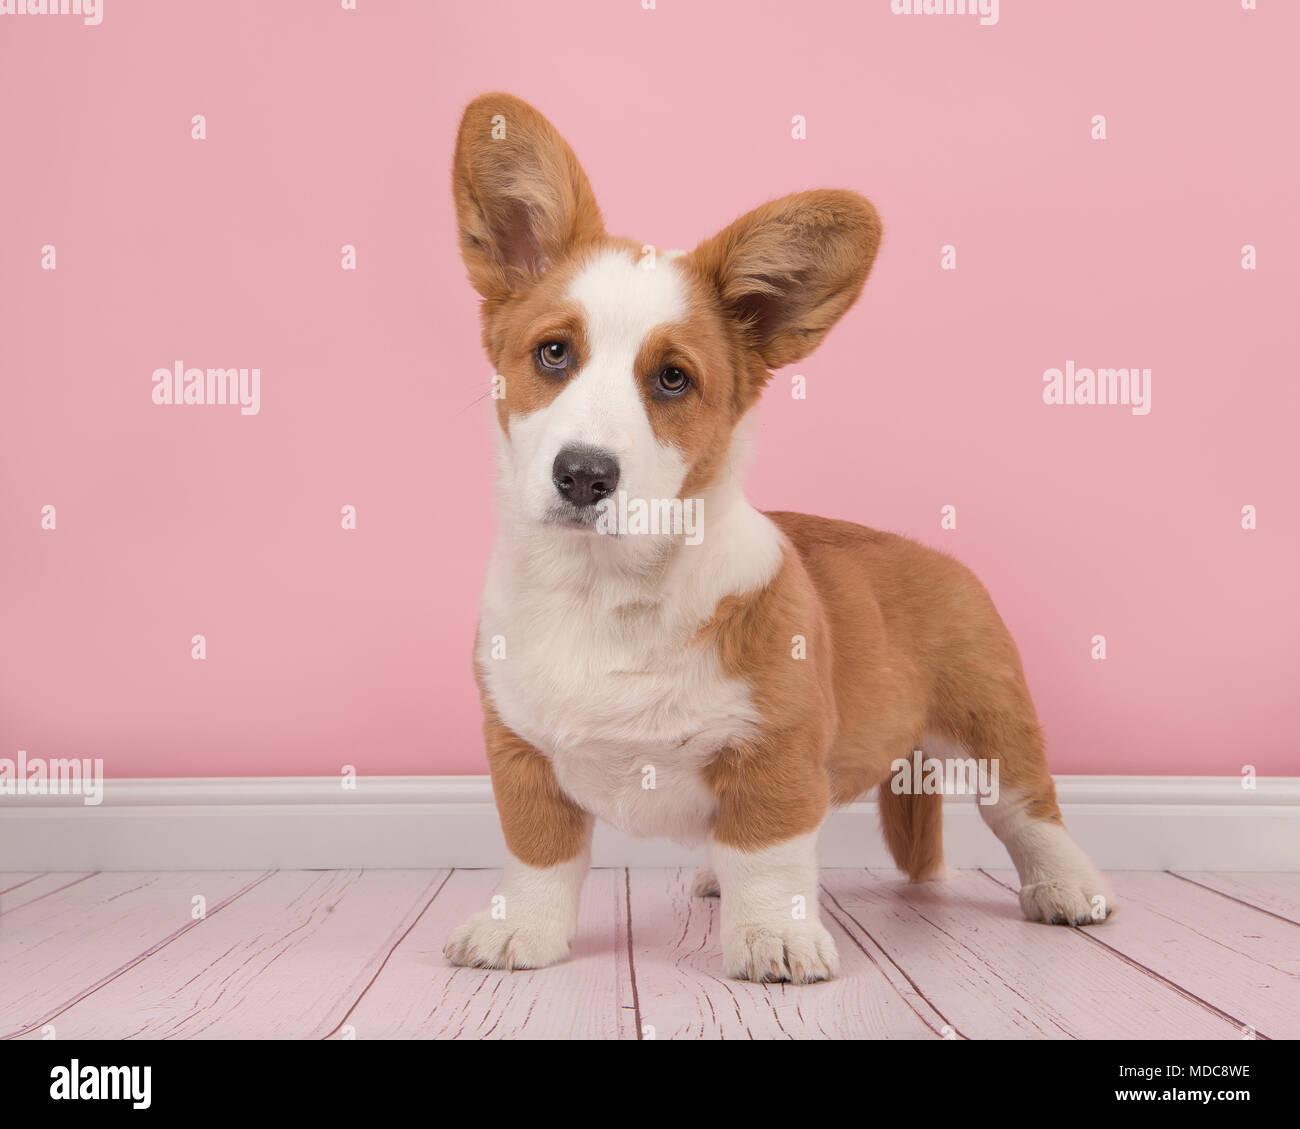 Cute Welsh Corgi pembroke cachorro de pie mirando a la cámara en un salón rosa Foto de stock